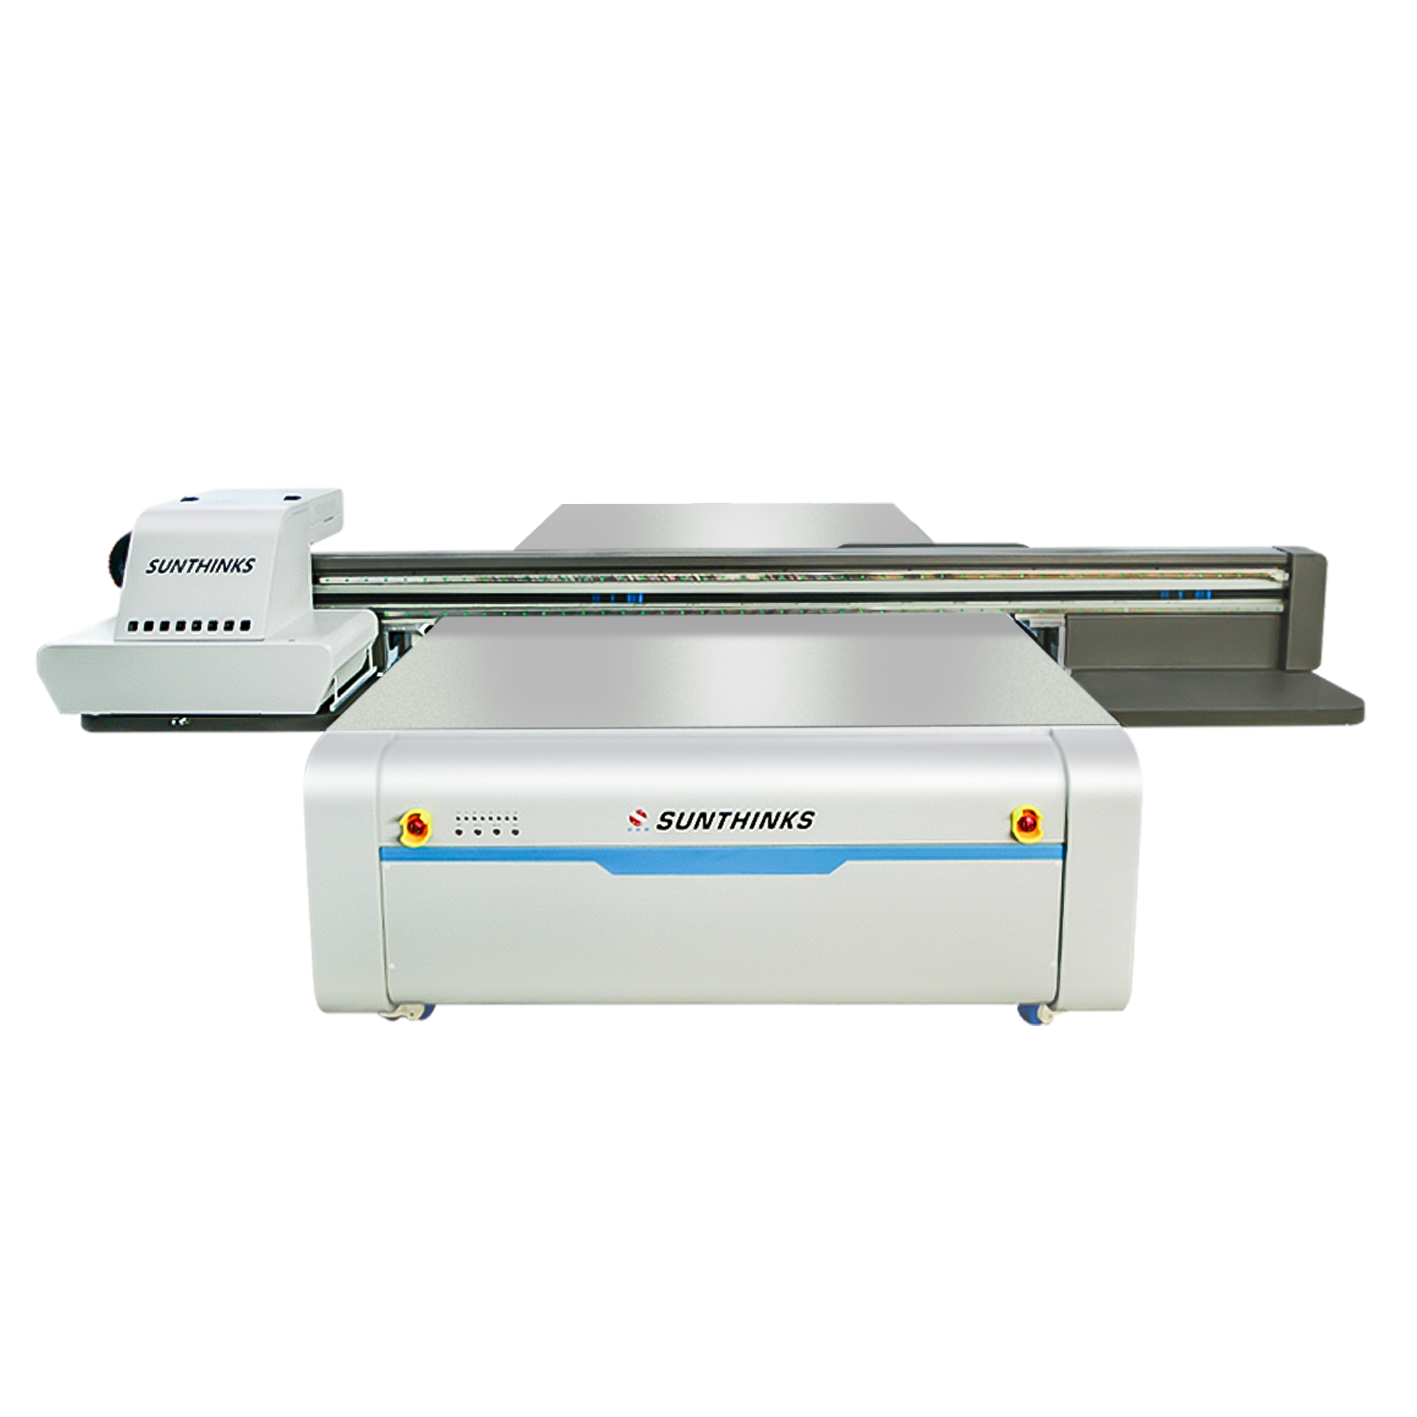 SUNTHINKS 2X3m Ricoh GEN6 UV flatbed printer